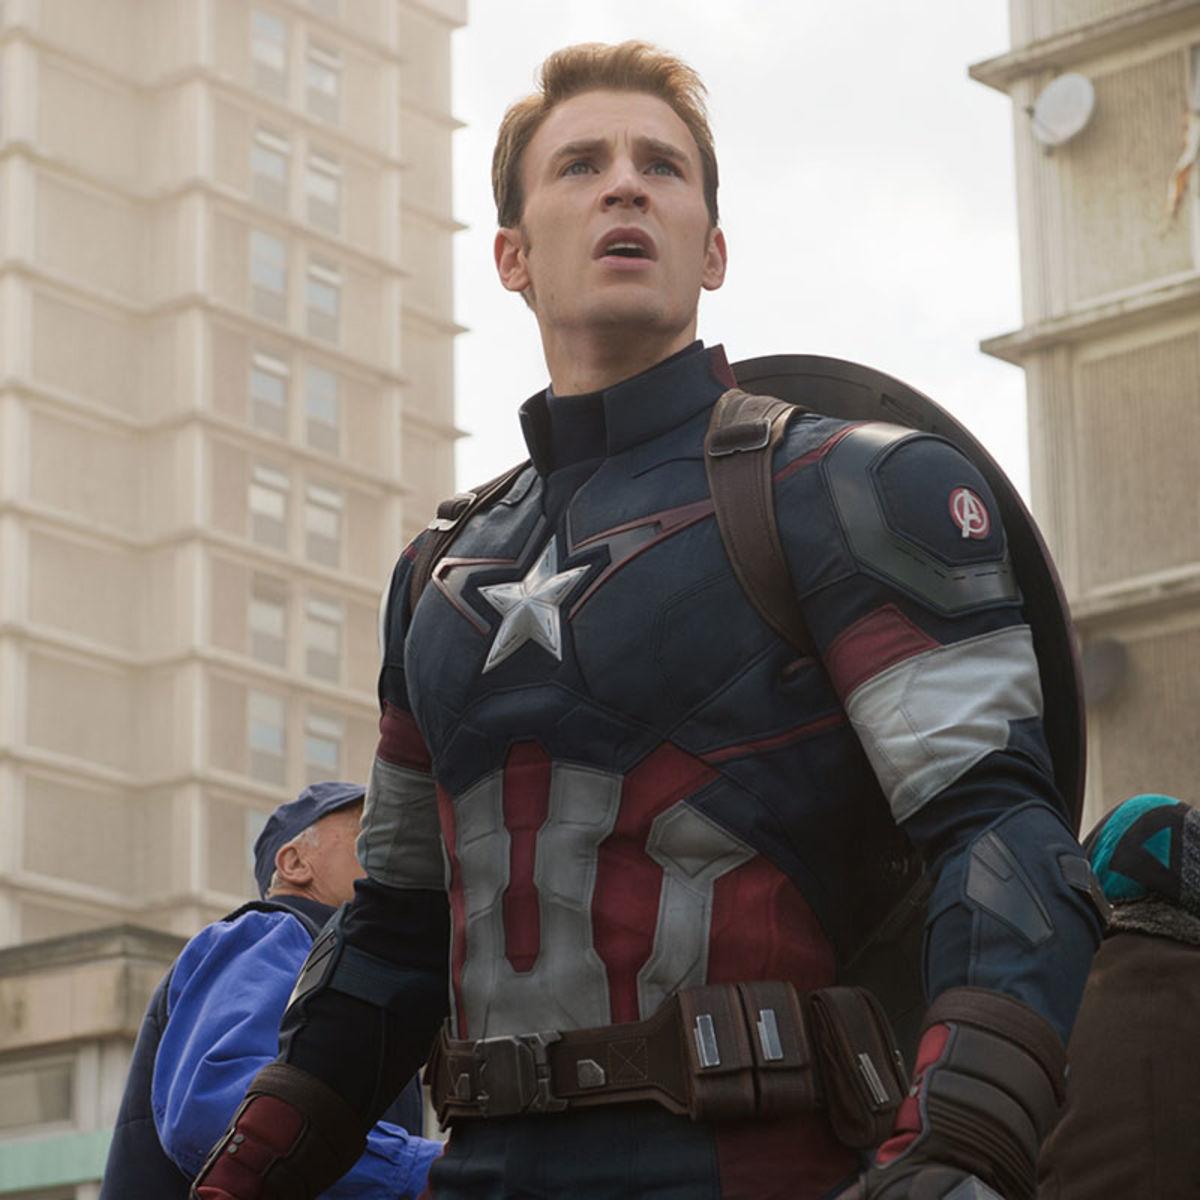 chris-evans-says-civil-war-sets-up-avengers-infinity-war.jpg